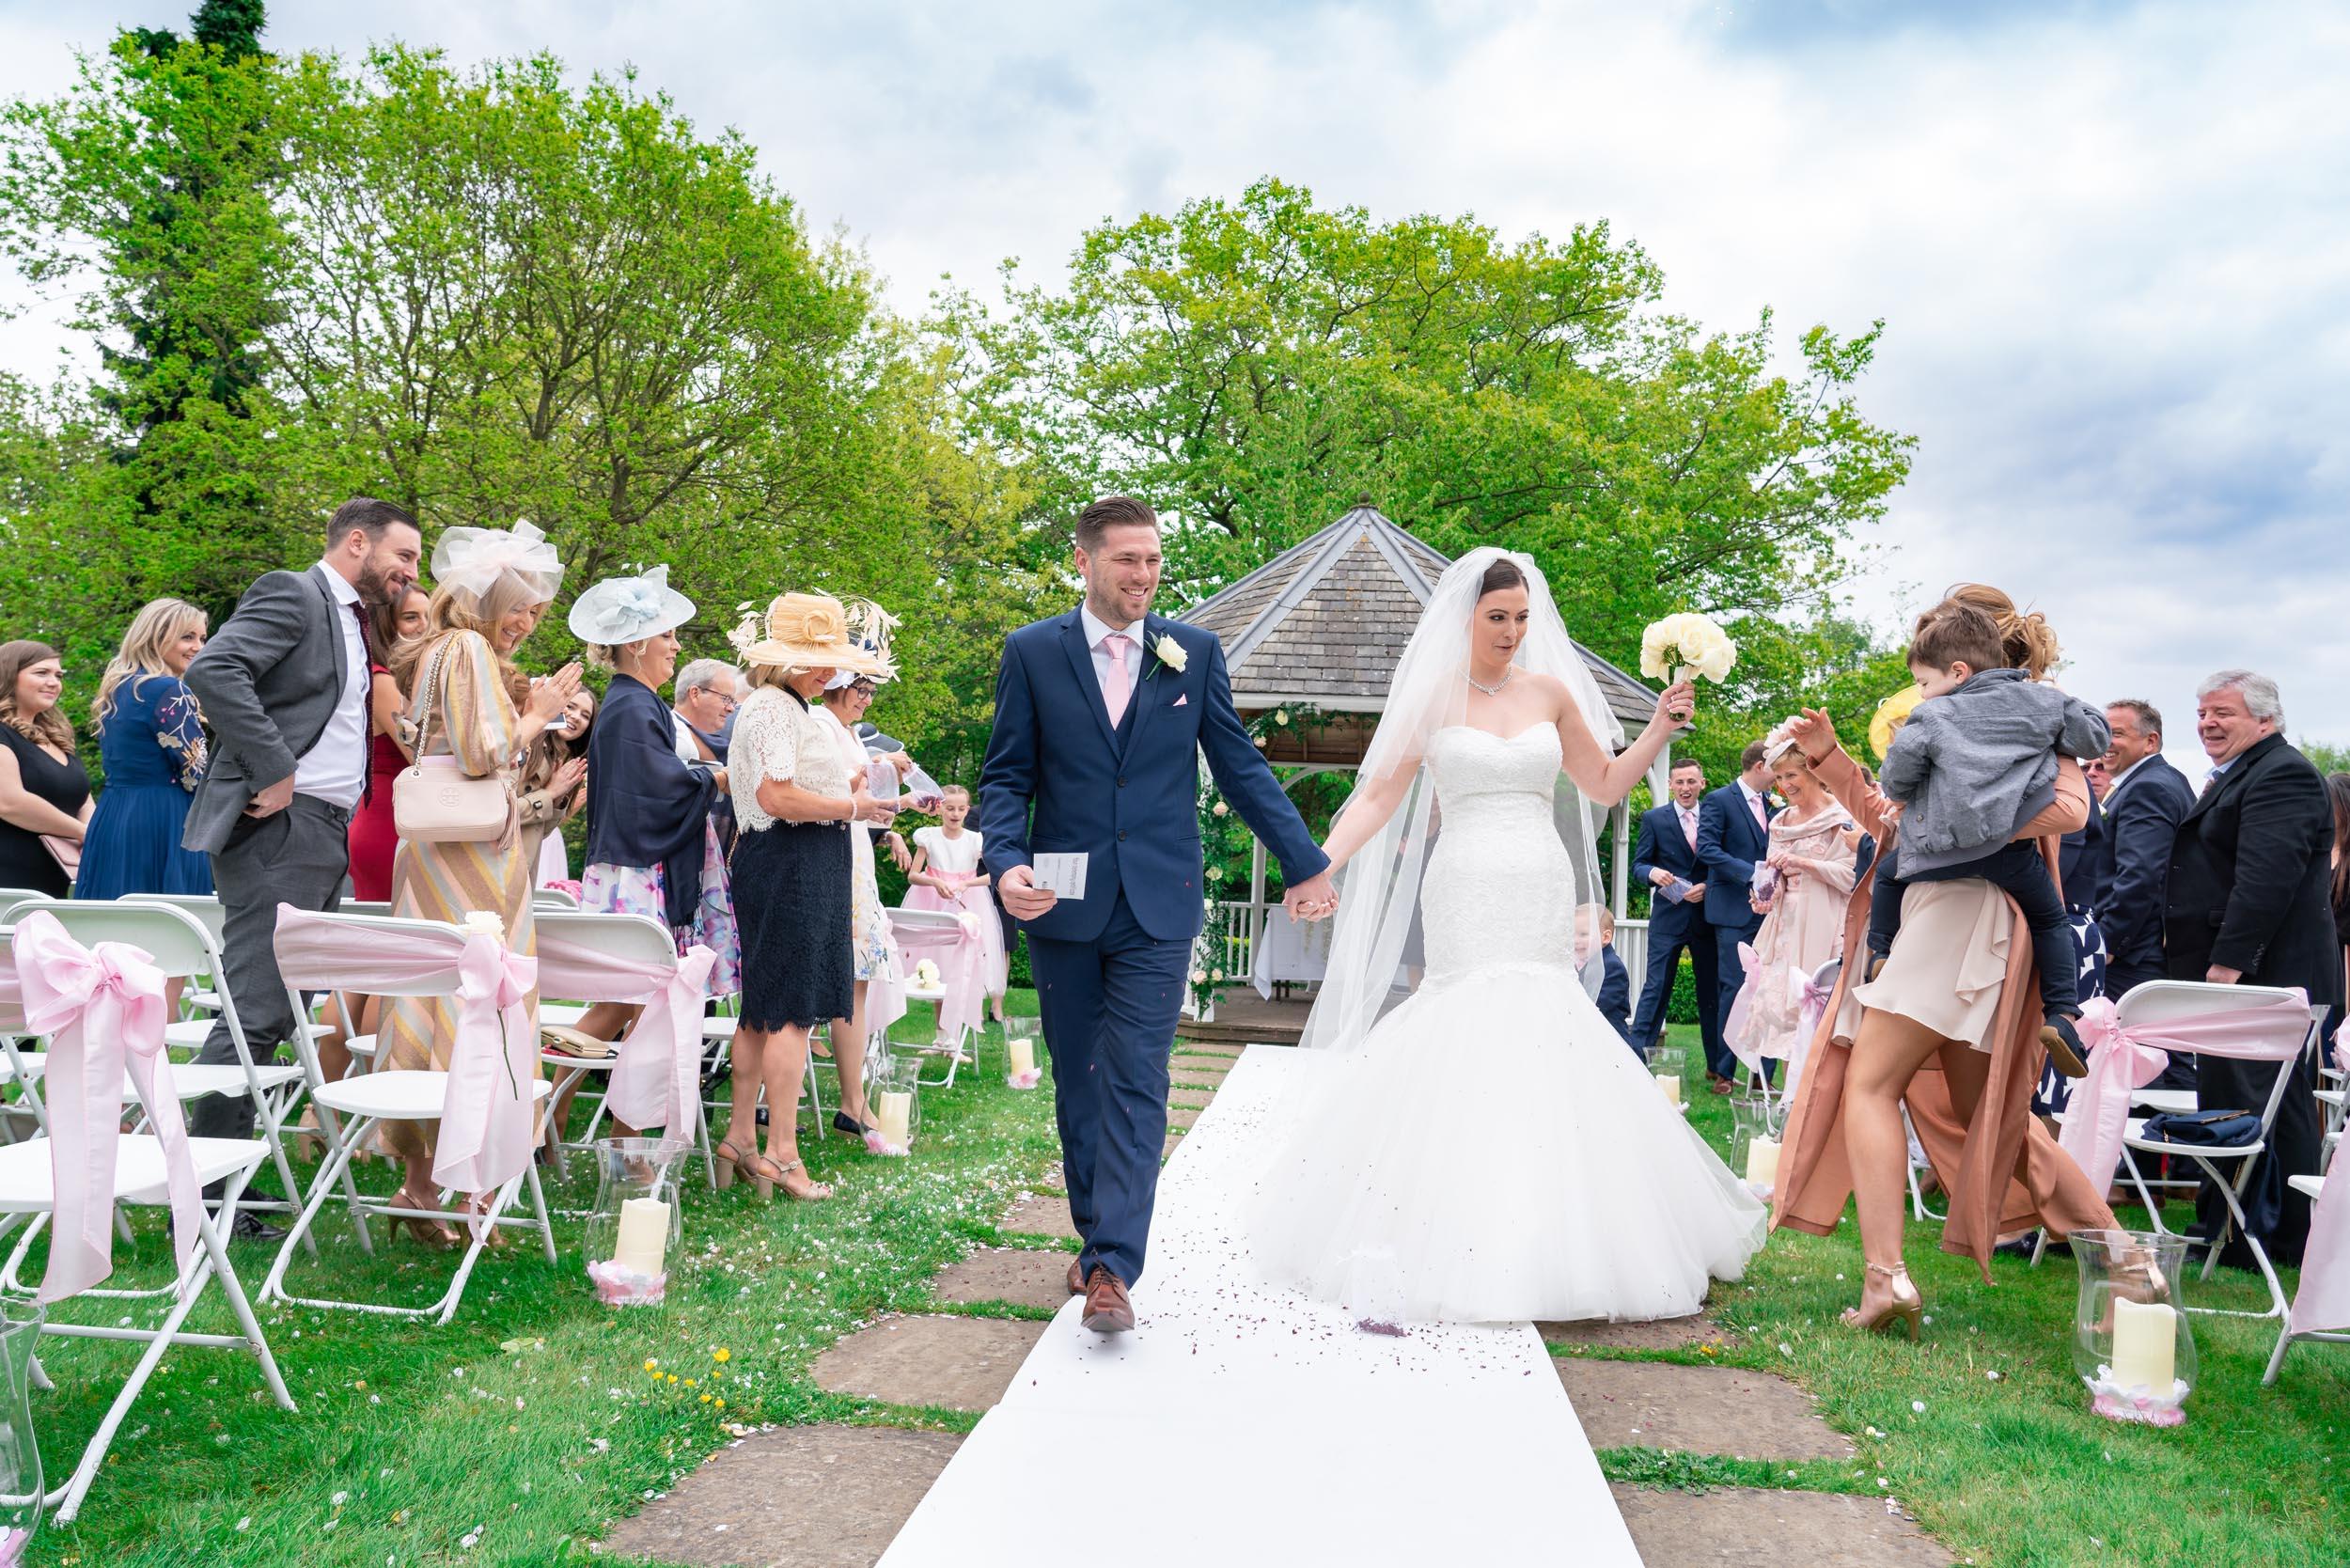 Wedding Ceremony Rowhill Grange 218.jpg